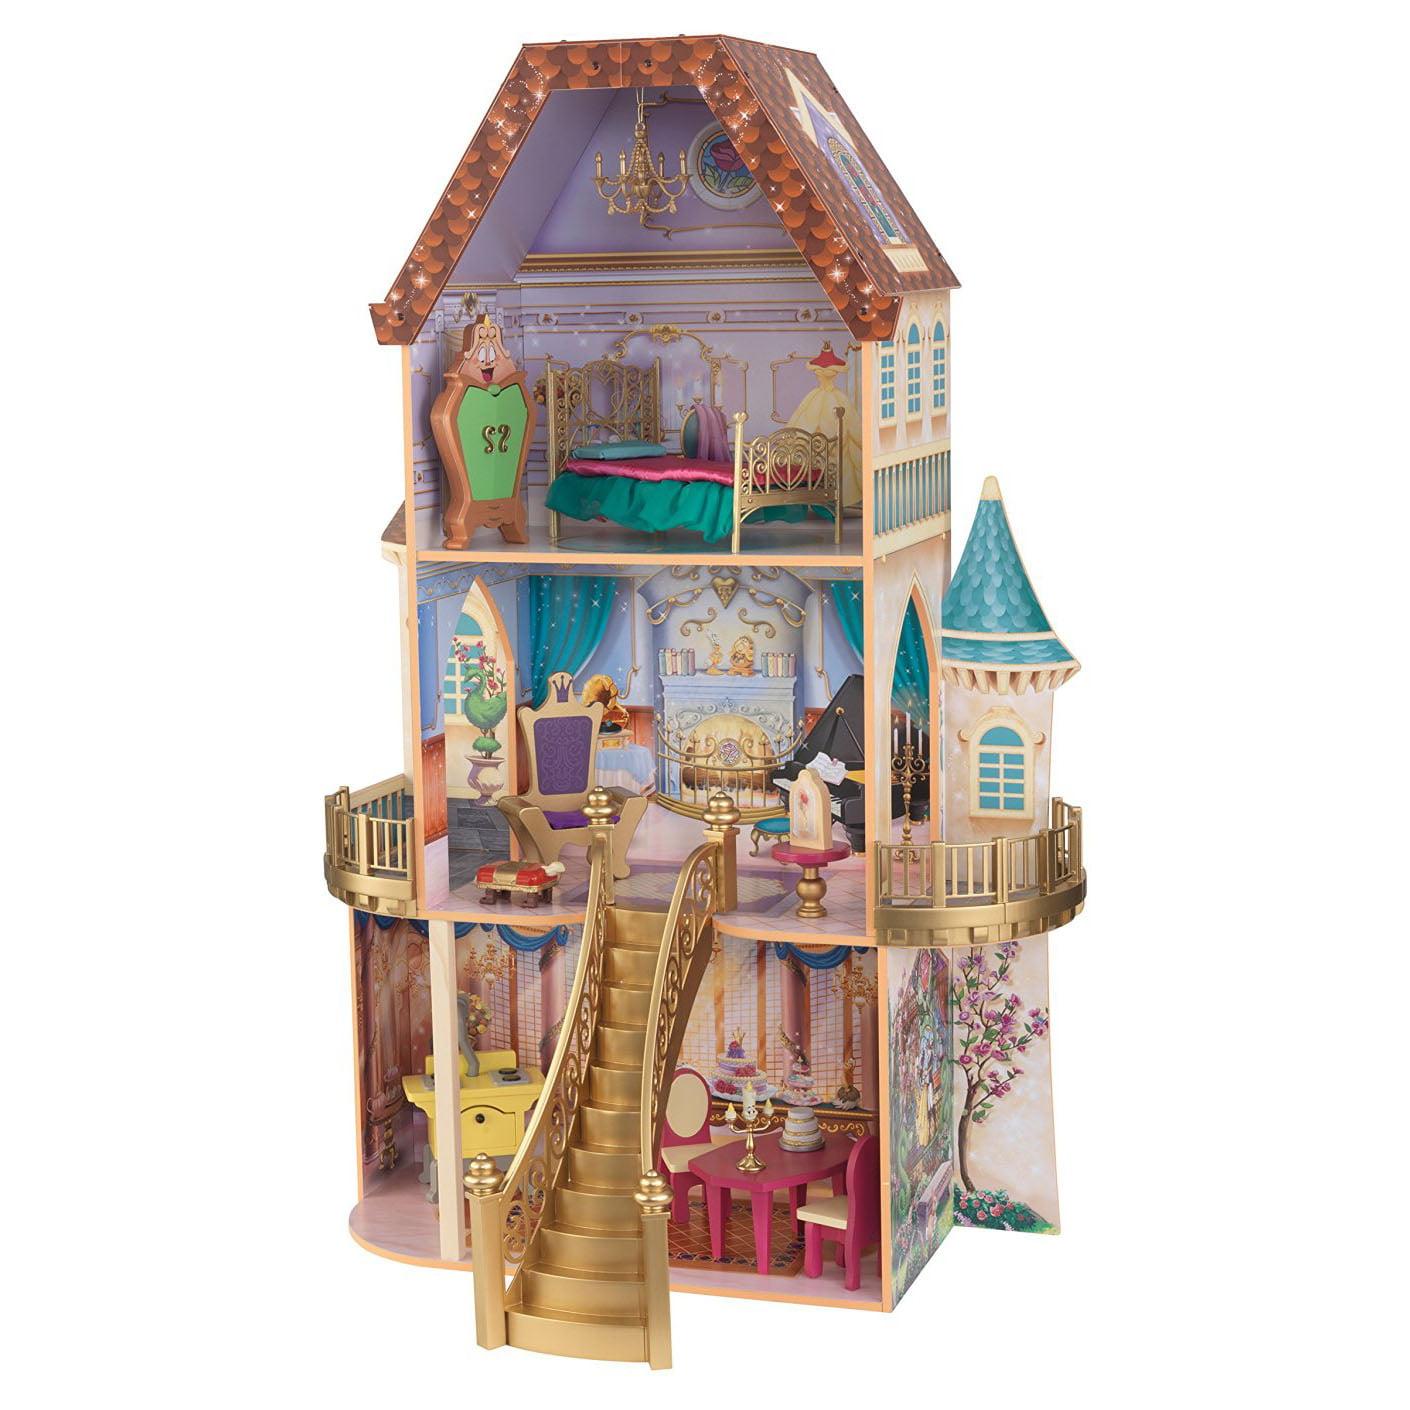 KidKraft Belle's Enchanted Dollhouse Barbie Dollhouse for Girls| 65912 by